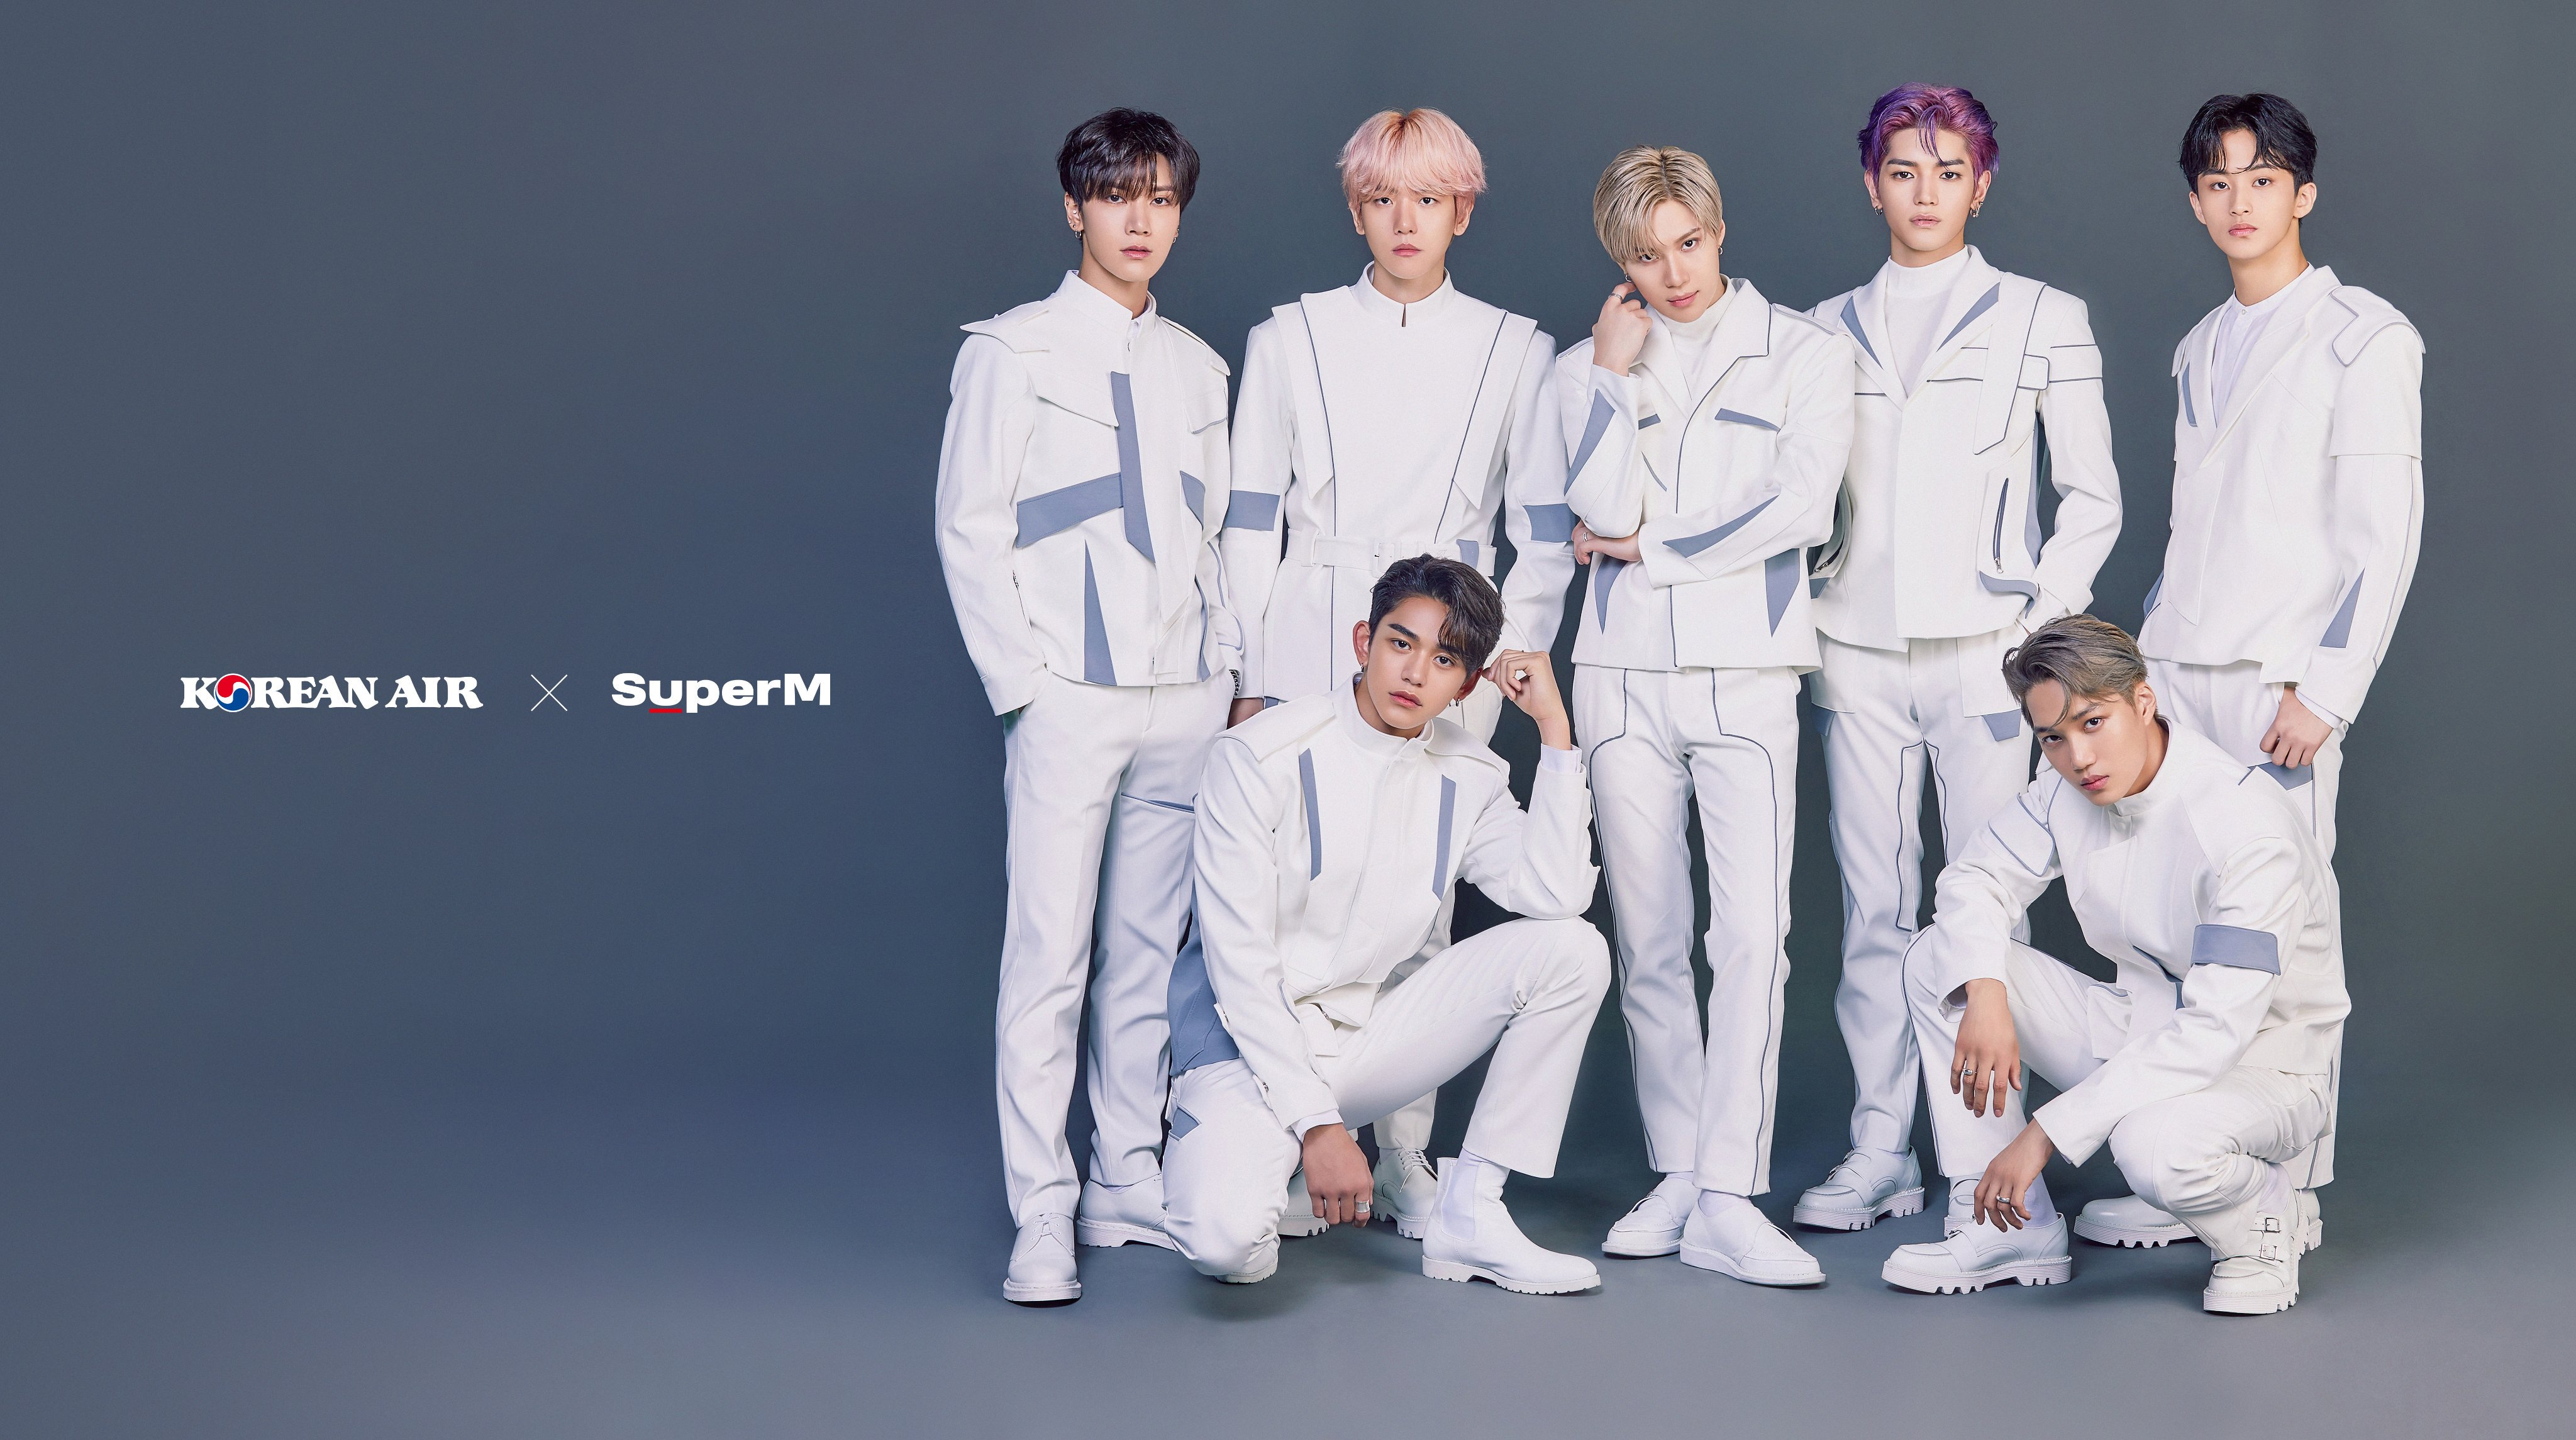 superm, superm profile, superm leader, superm facts, superm height, superm age, superm comeback, superm korean air,